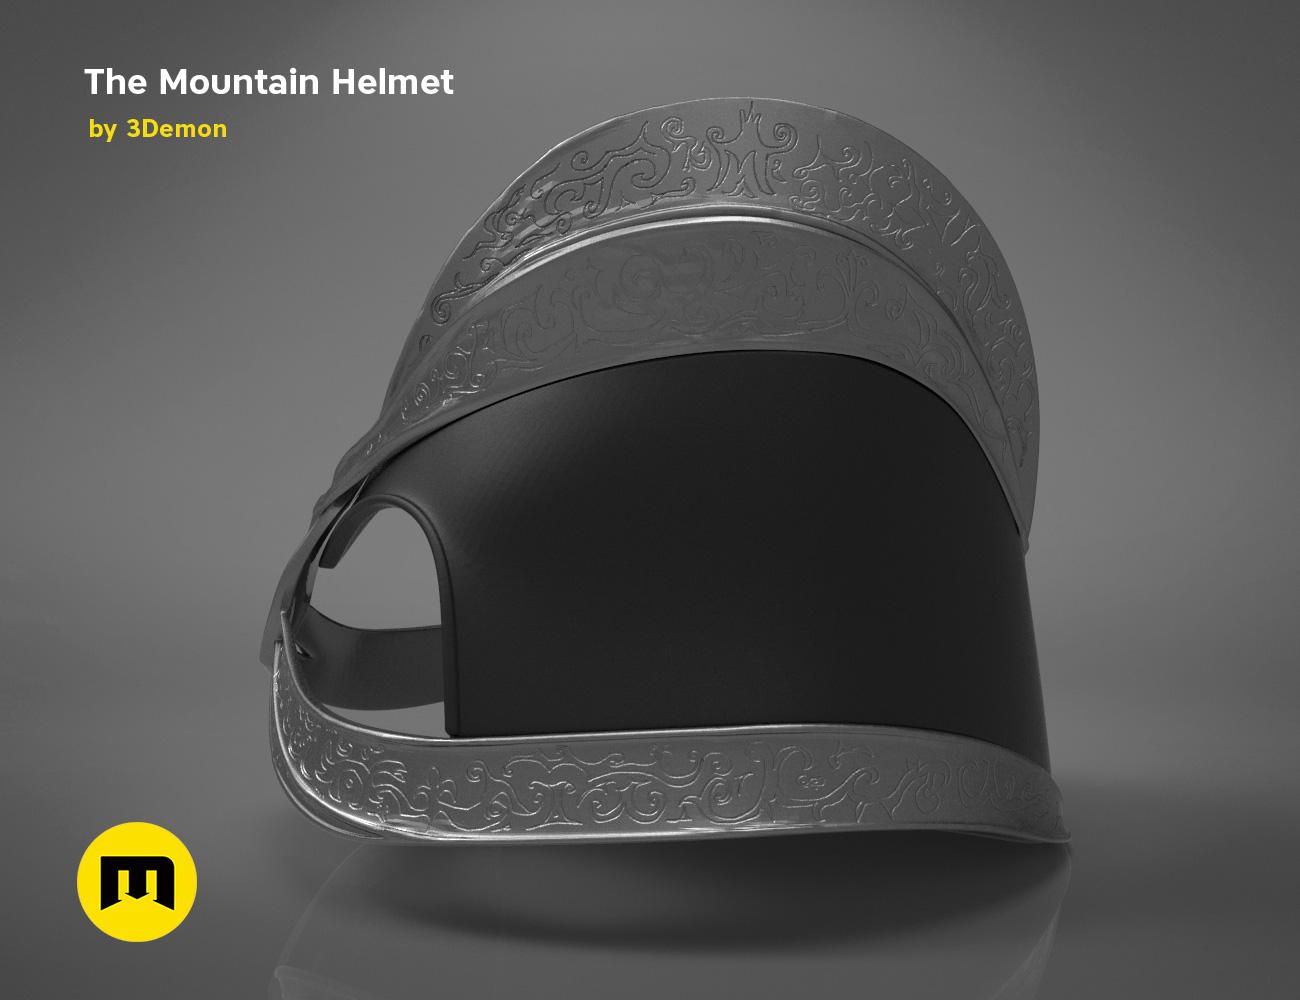 GoT-mountain-helmet-color.647.jpg Download STL file The Mountain Helmet – Game of Thrones • 3D printing model, 3D-mon